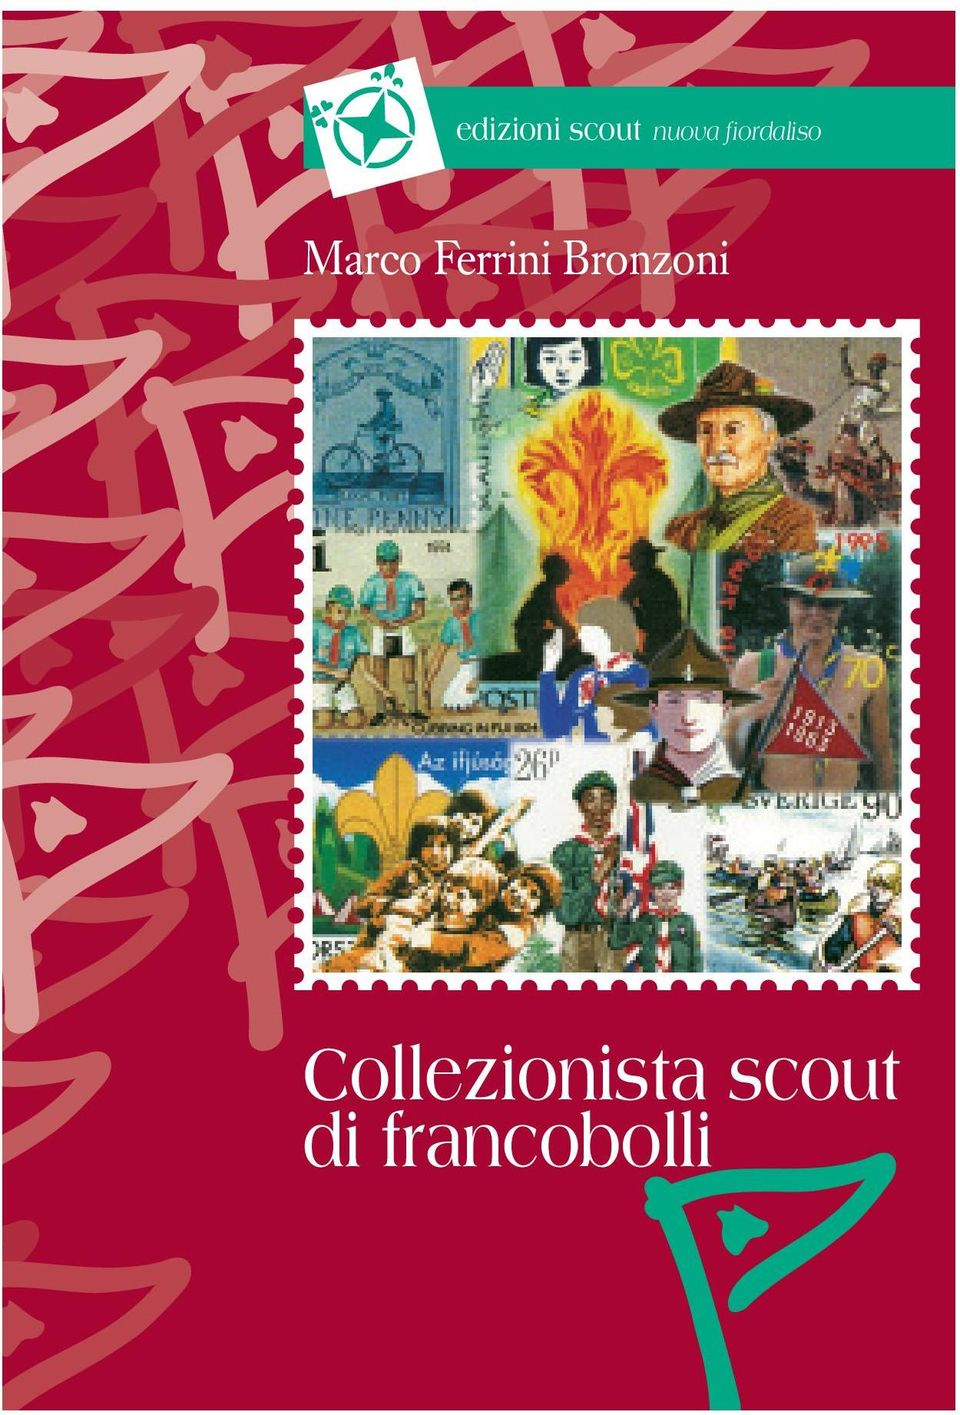 Collezionista scout di francobolli